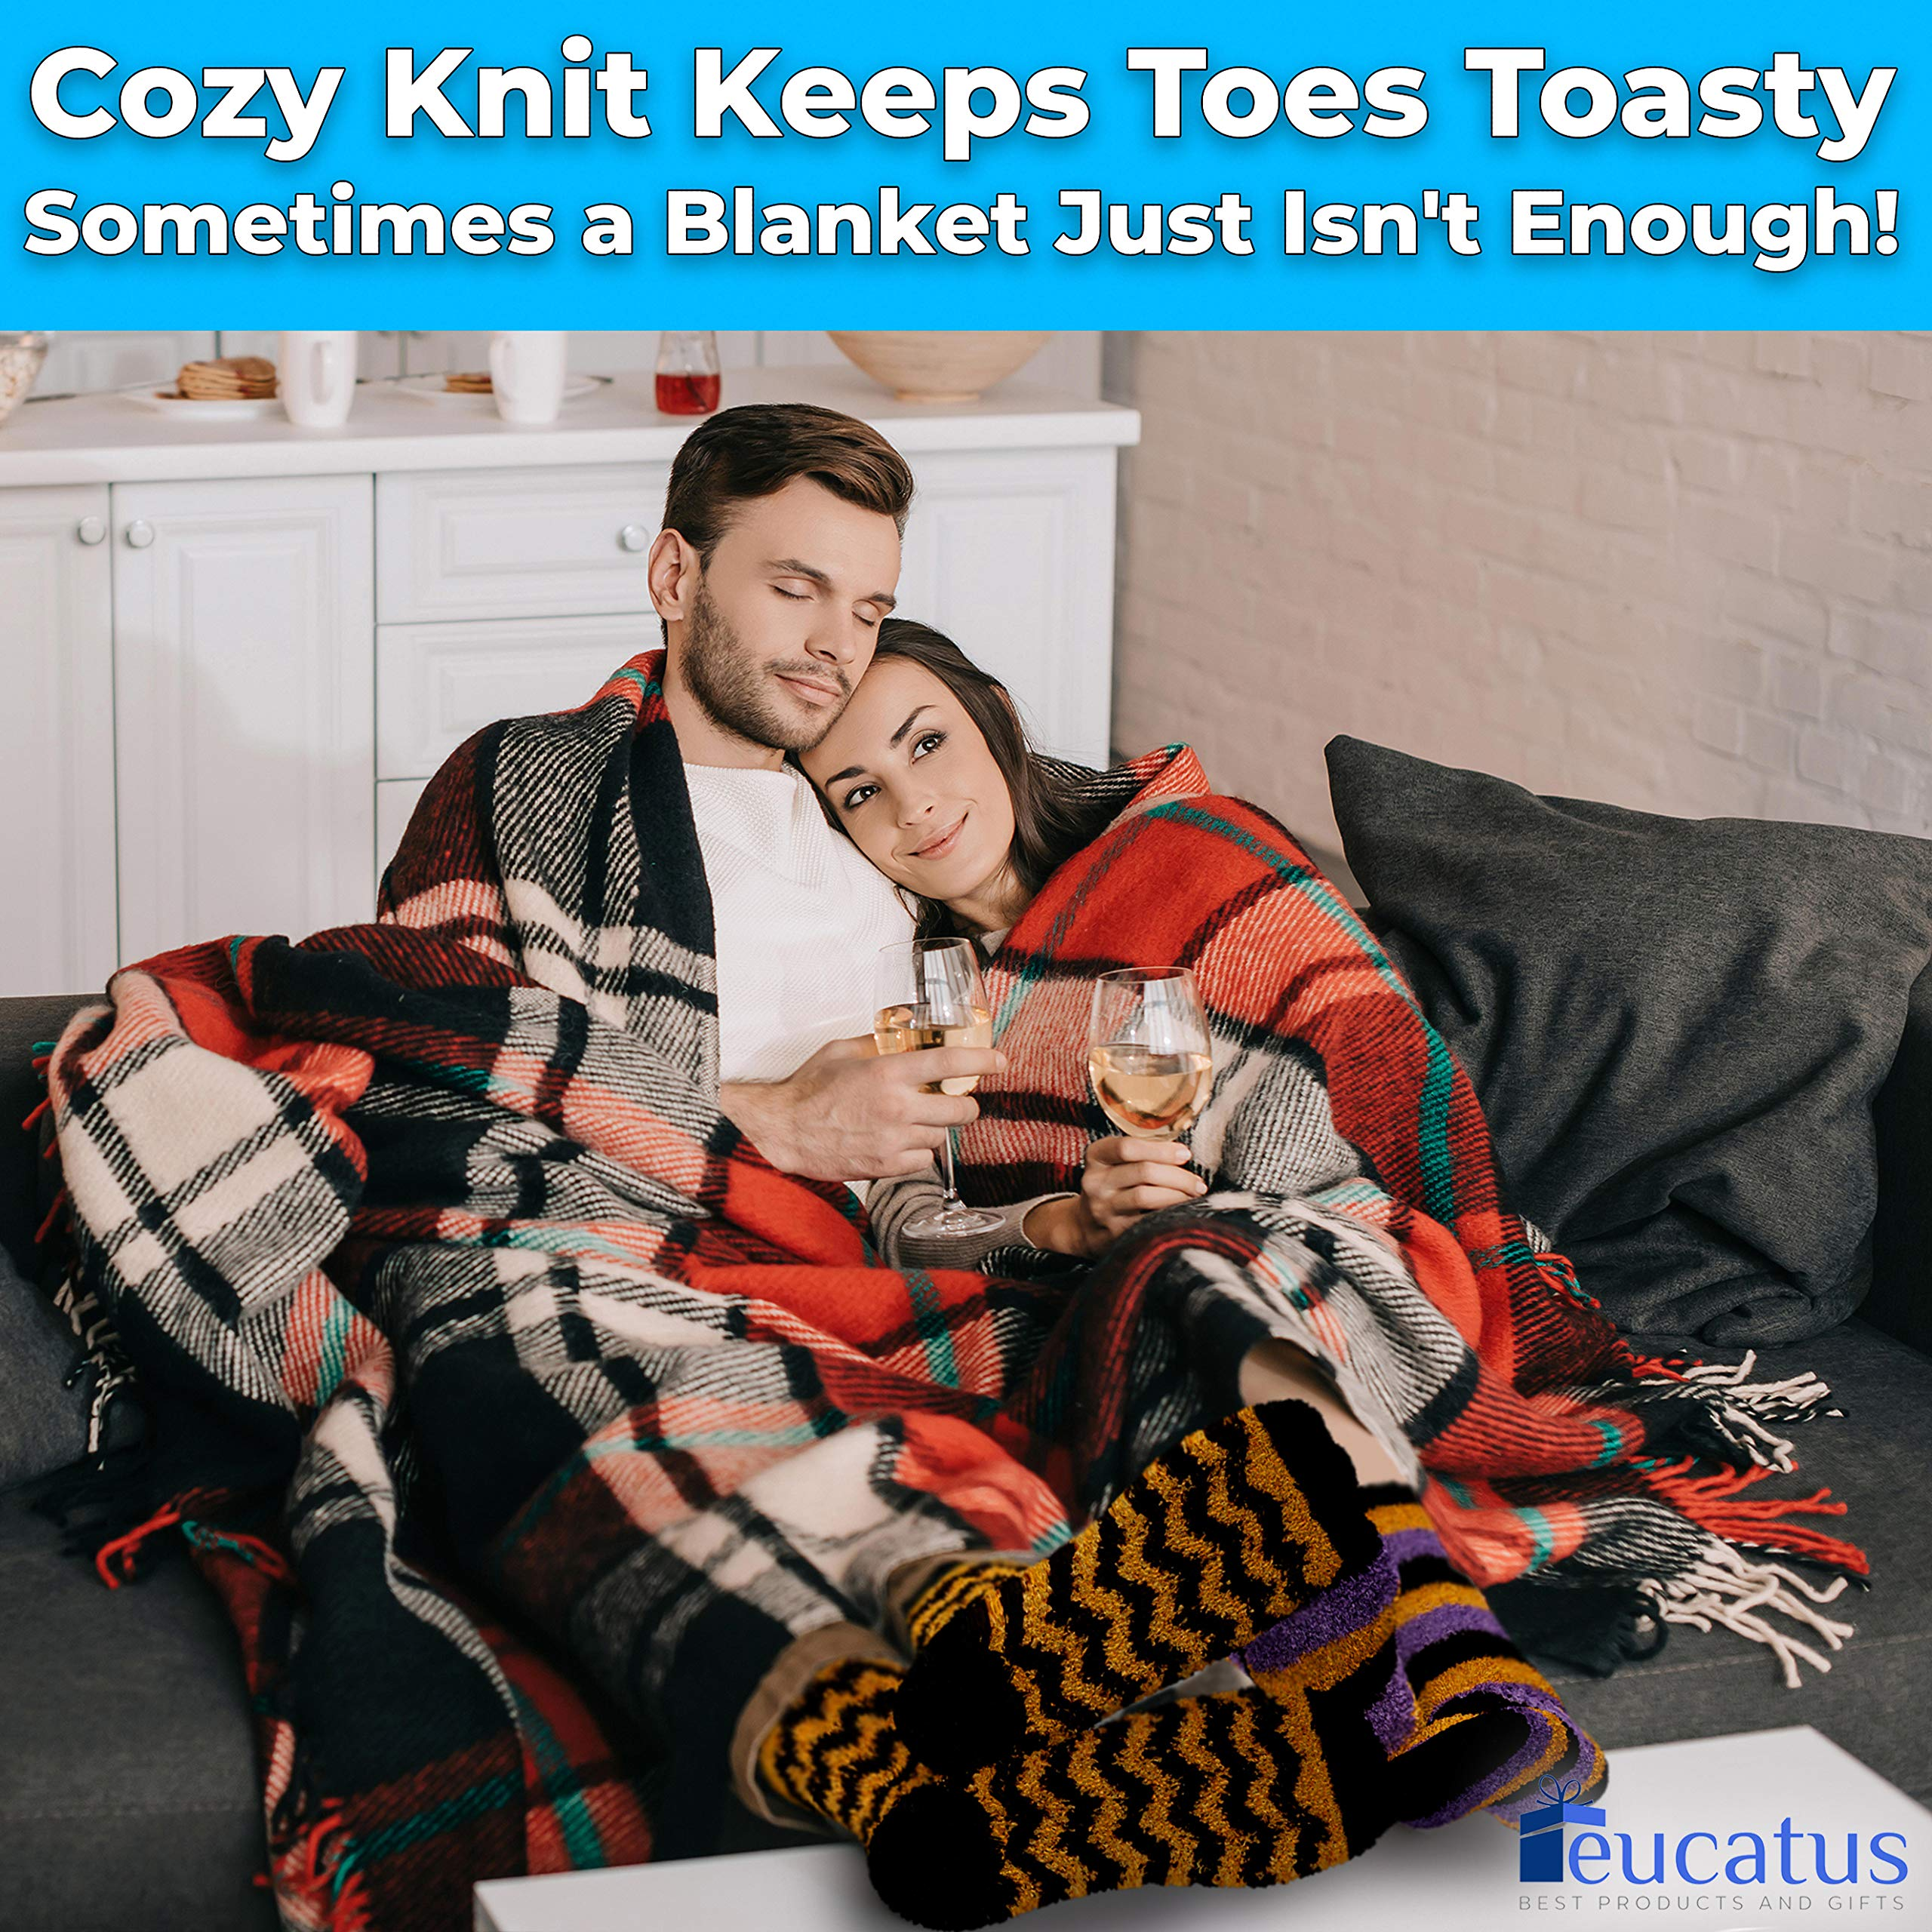 miniature 15 - Super Soft, Fuzzy Halloween Spa Socks in Gift Ornament, Womens Size 6-10